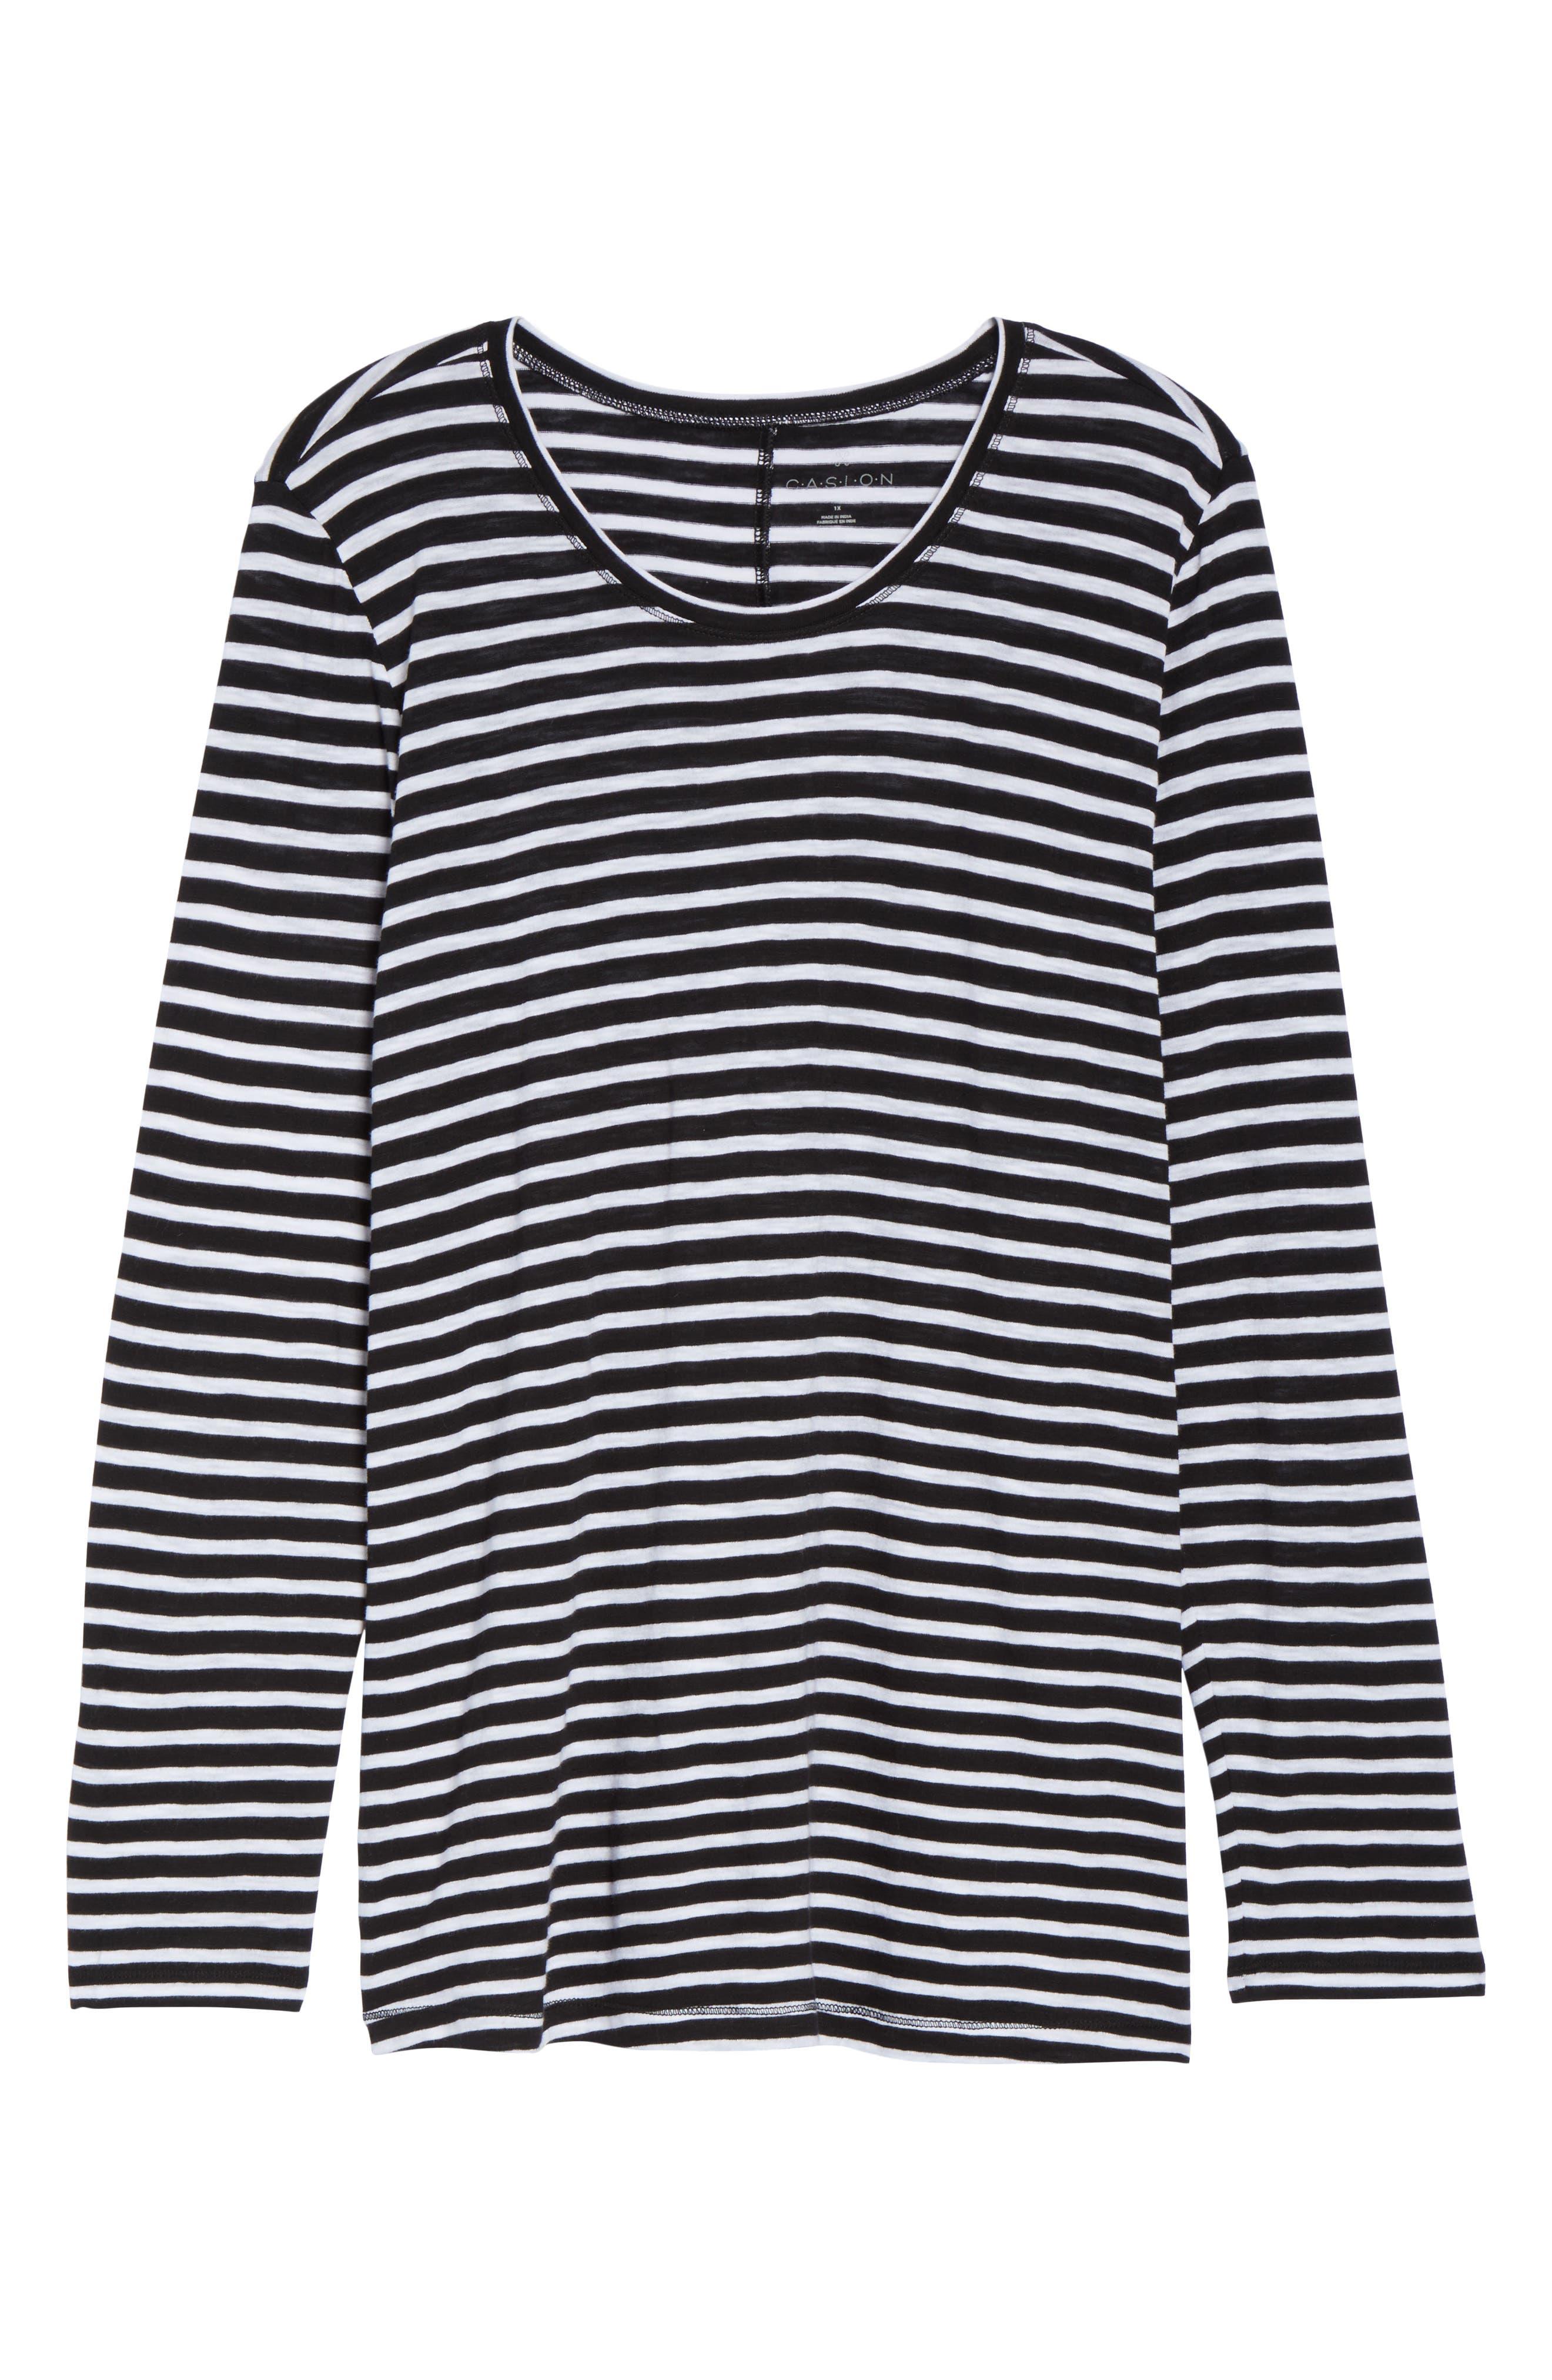 Long Sleeve Crewneck Tee,                             Alternate thumbnail 37, color,                             Black- White Maisie Stripe